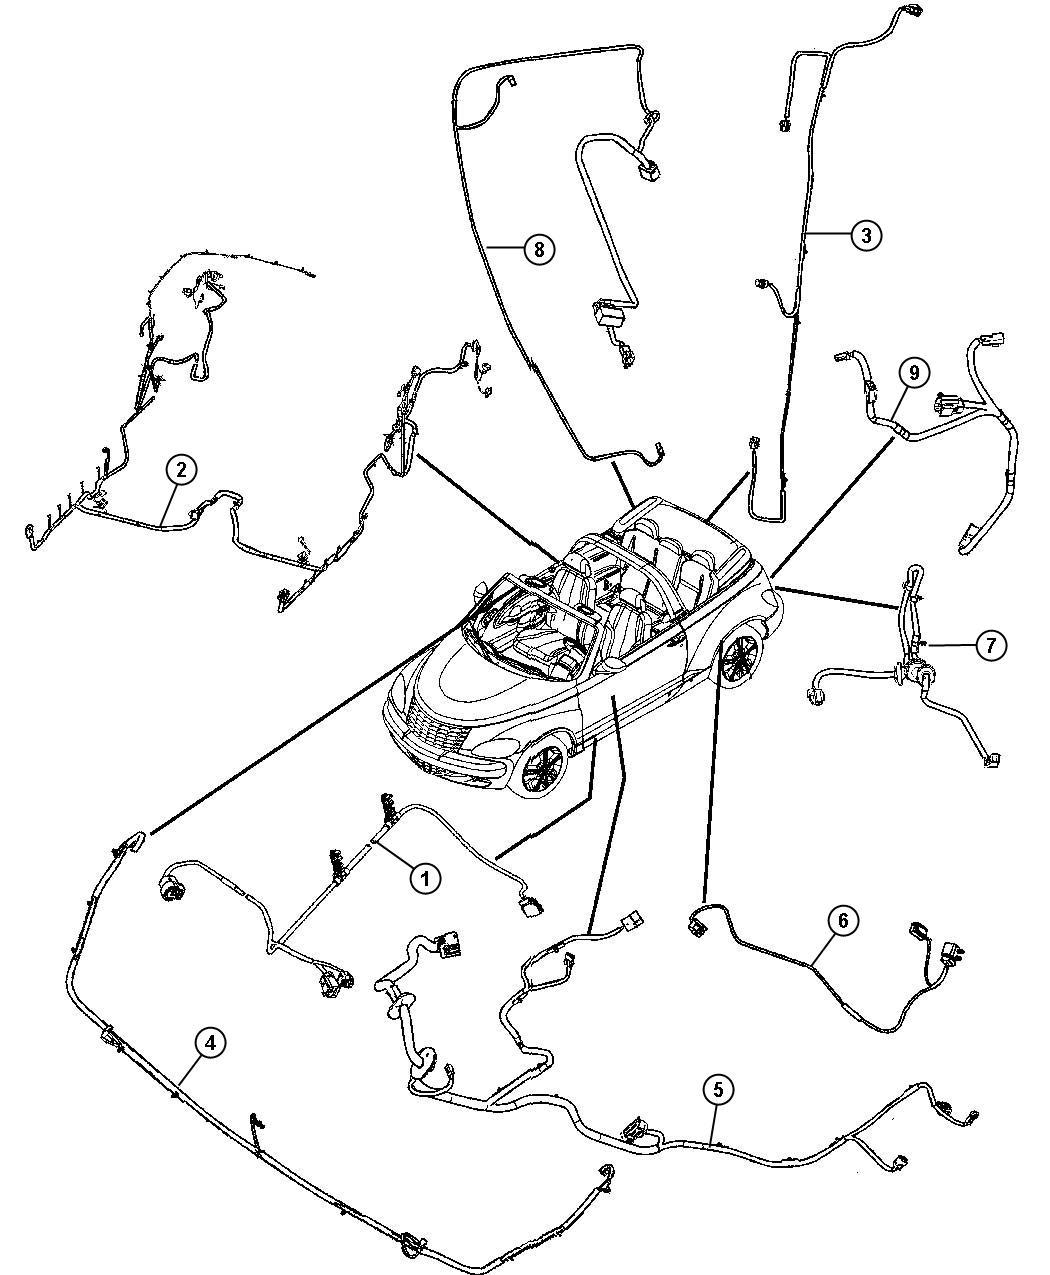 Chrysler PT Cruiser Wiring. Deck lid. [speed sensitive